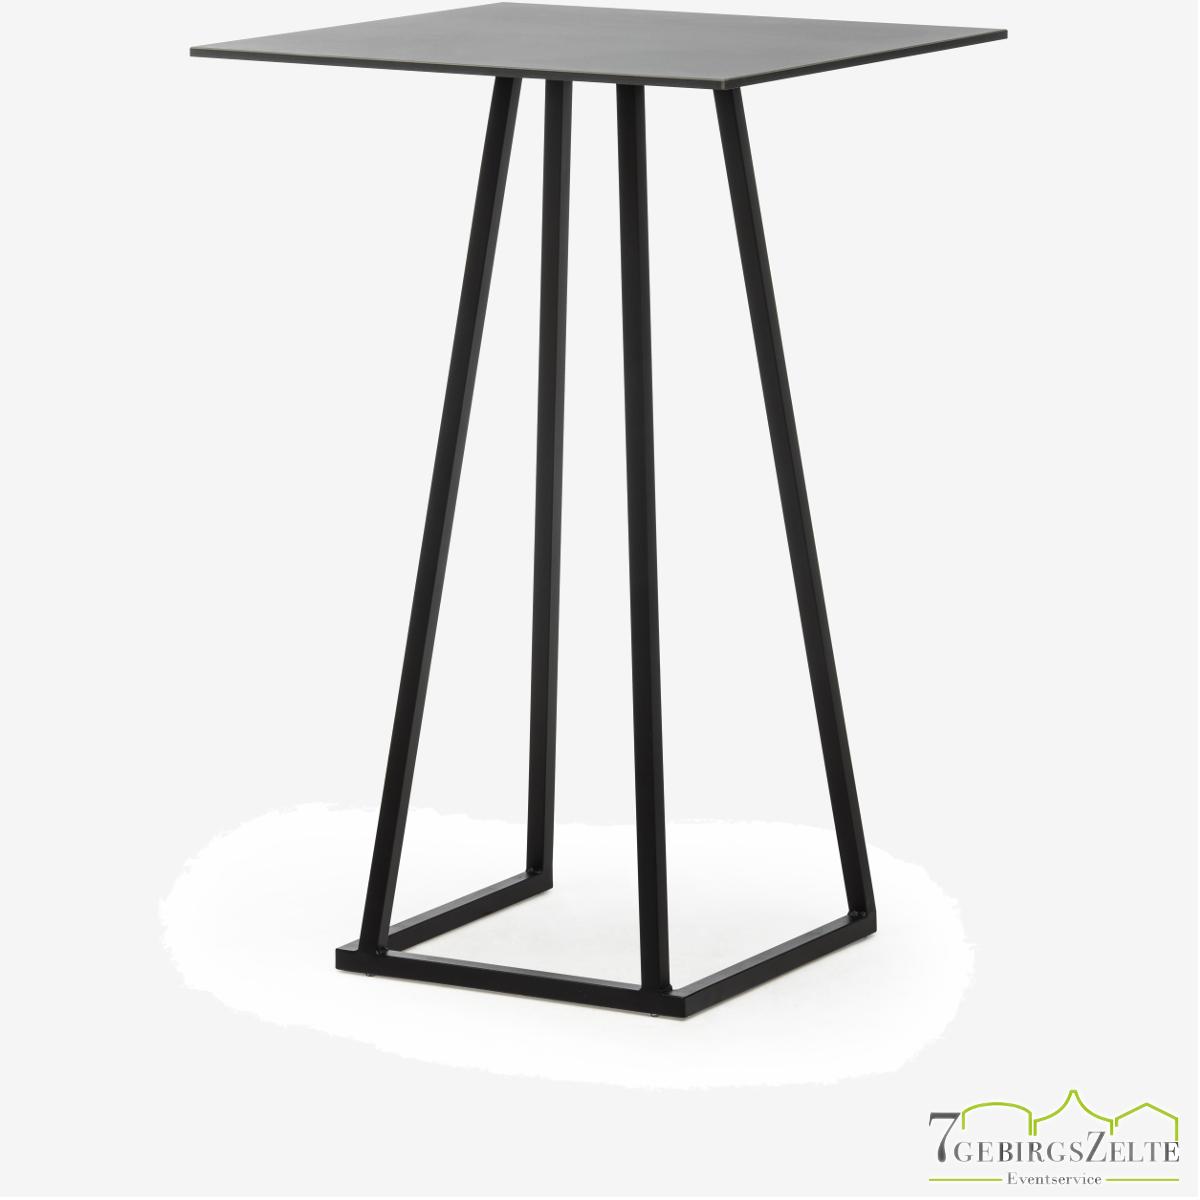 Linéa Party 70x70x110 - alu schwarz  - top compact schwarz